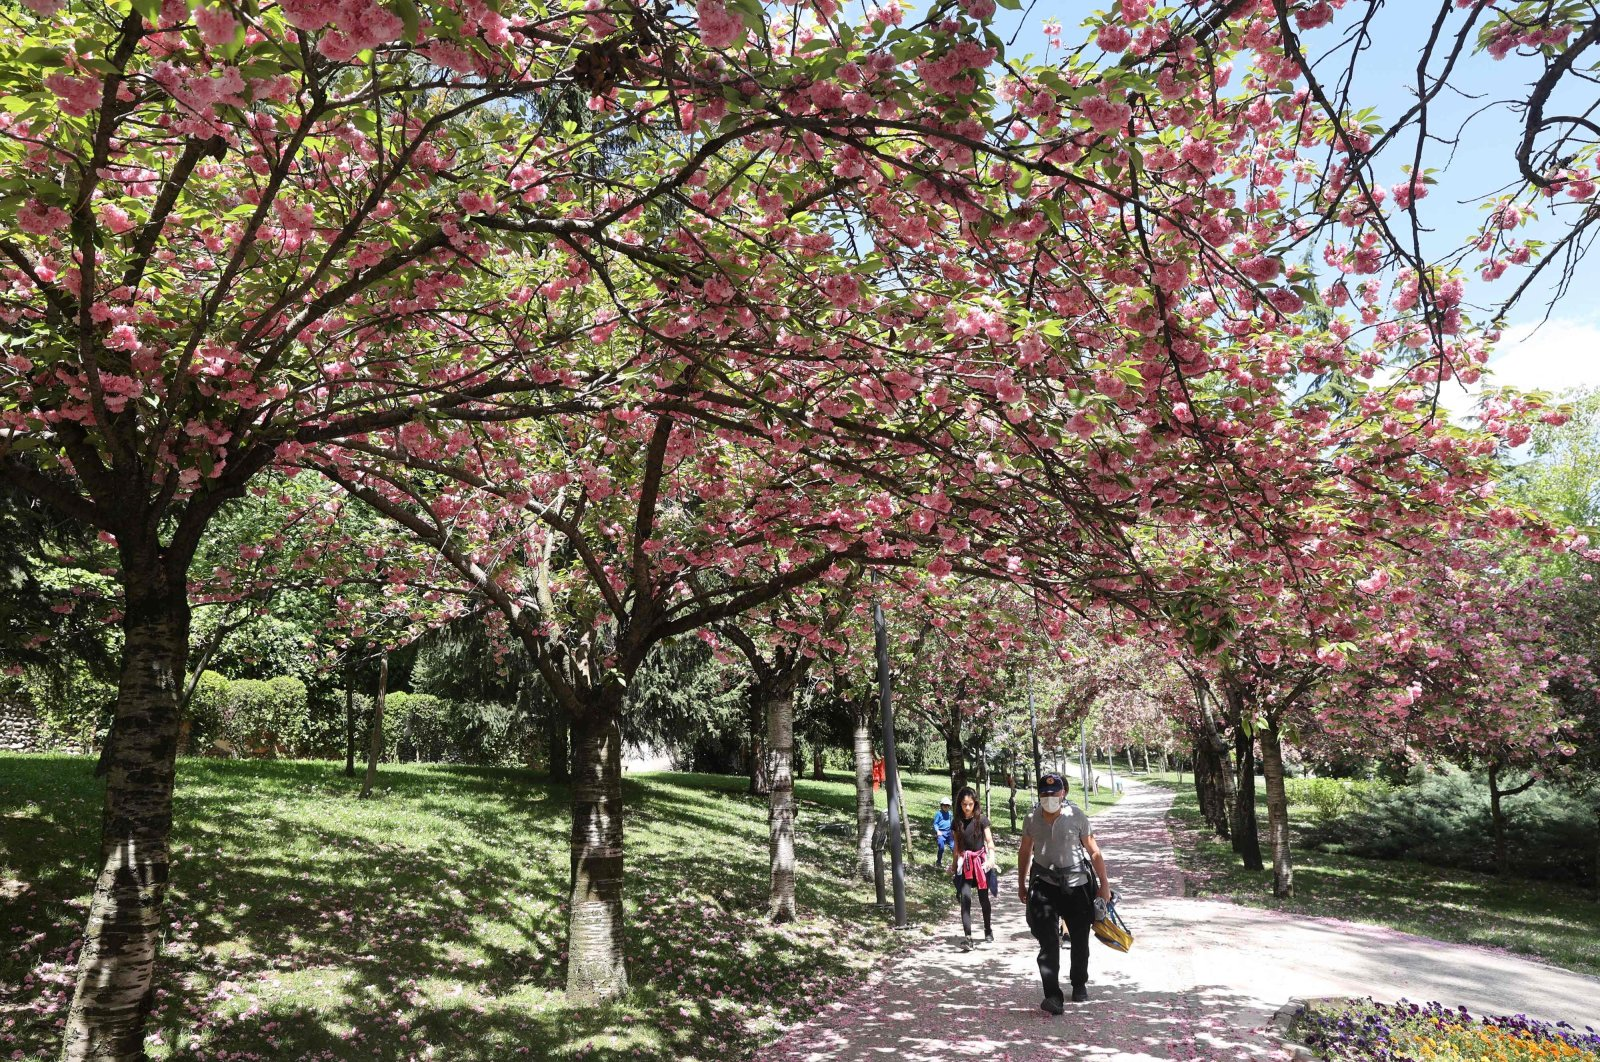 People walk under blooming Asian cherry trees at Dikmen Valley Park in Ankara, Turkey, on May 7, 2021. (AFP Photo)